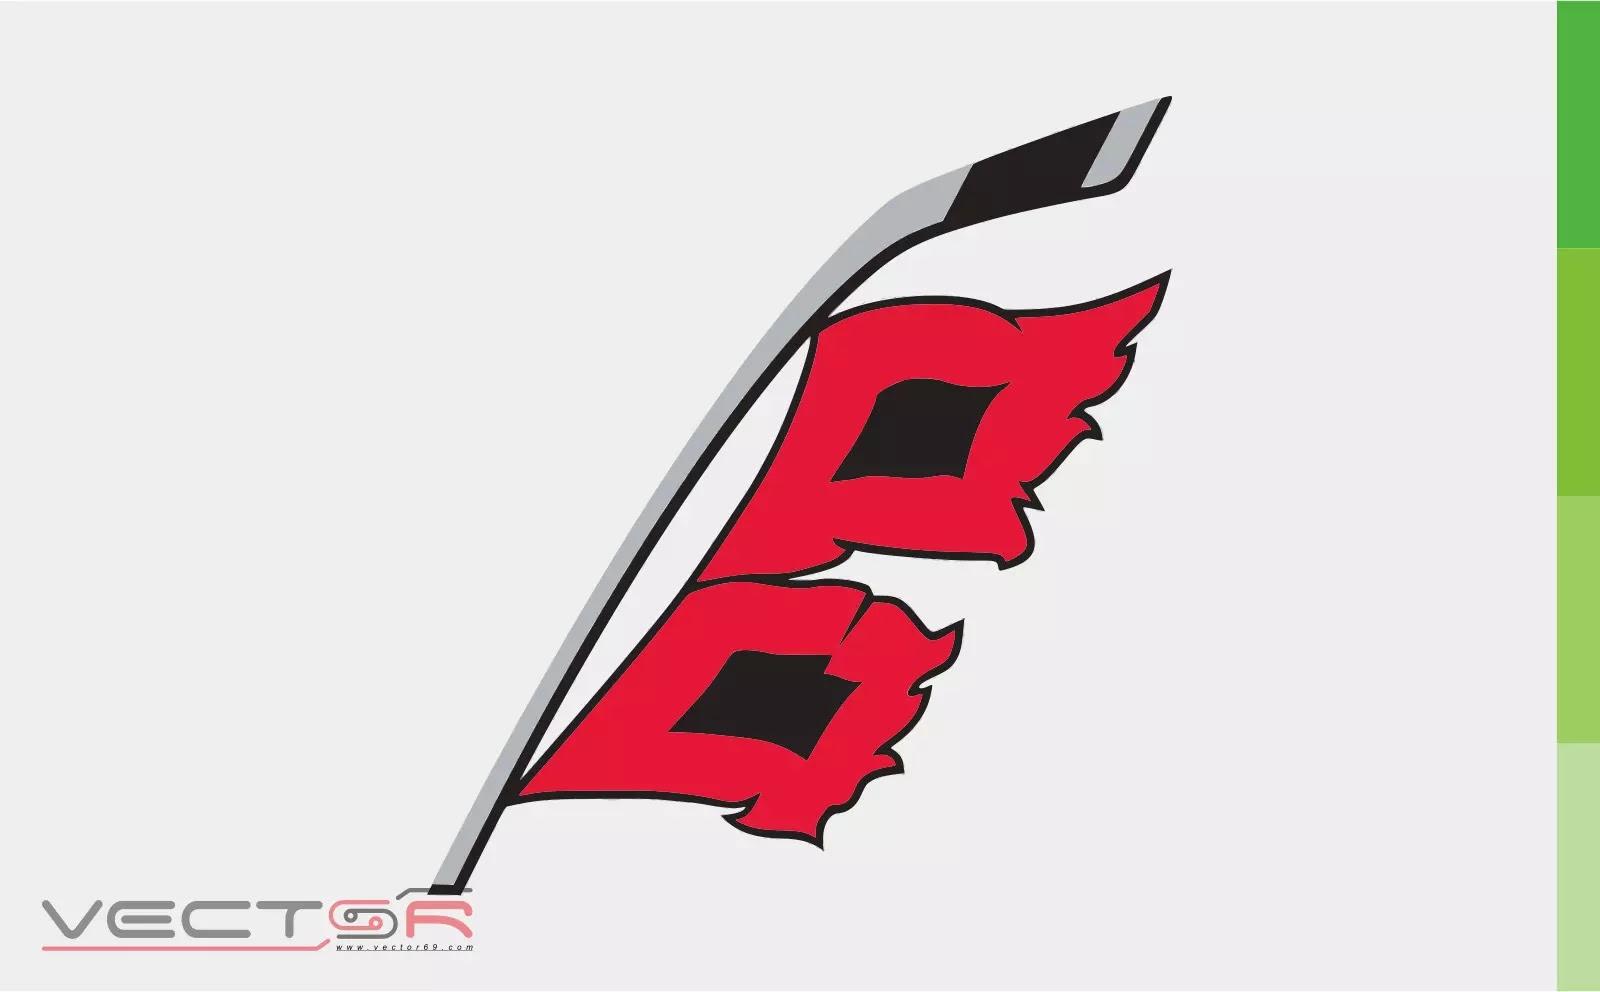 Carolina Hurricanes (2018) Secondary Logo - Download Vector File CDR (CorelDraw)